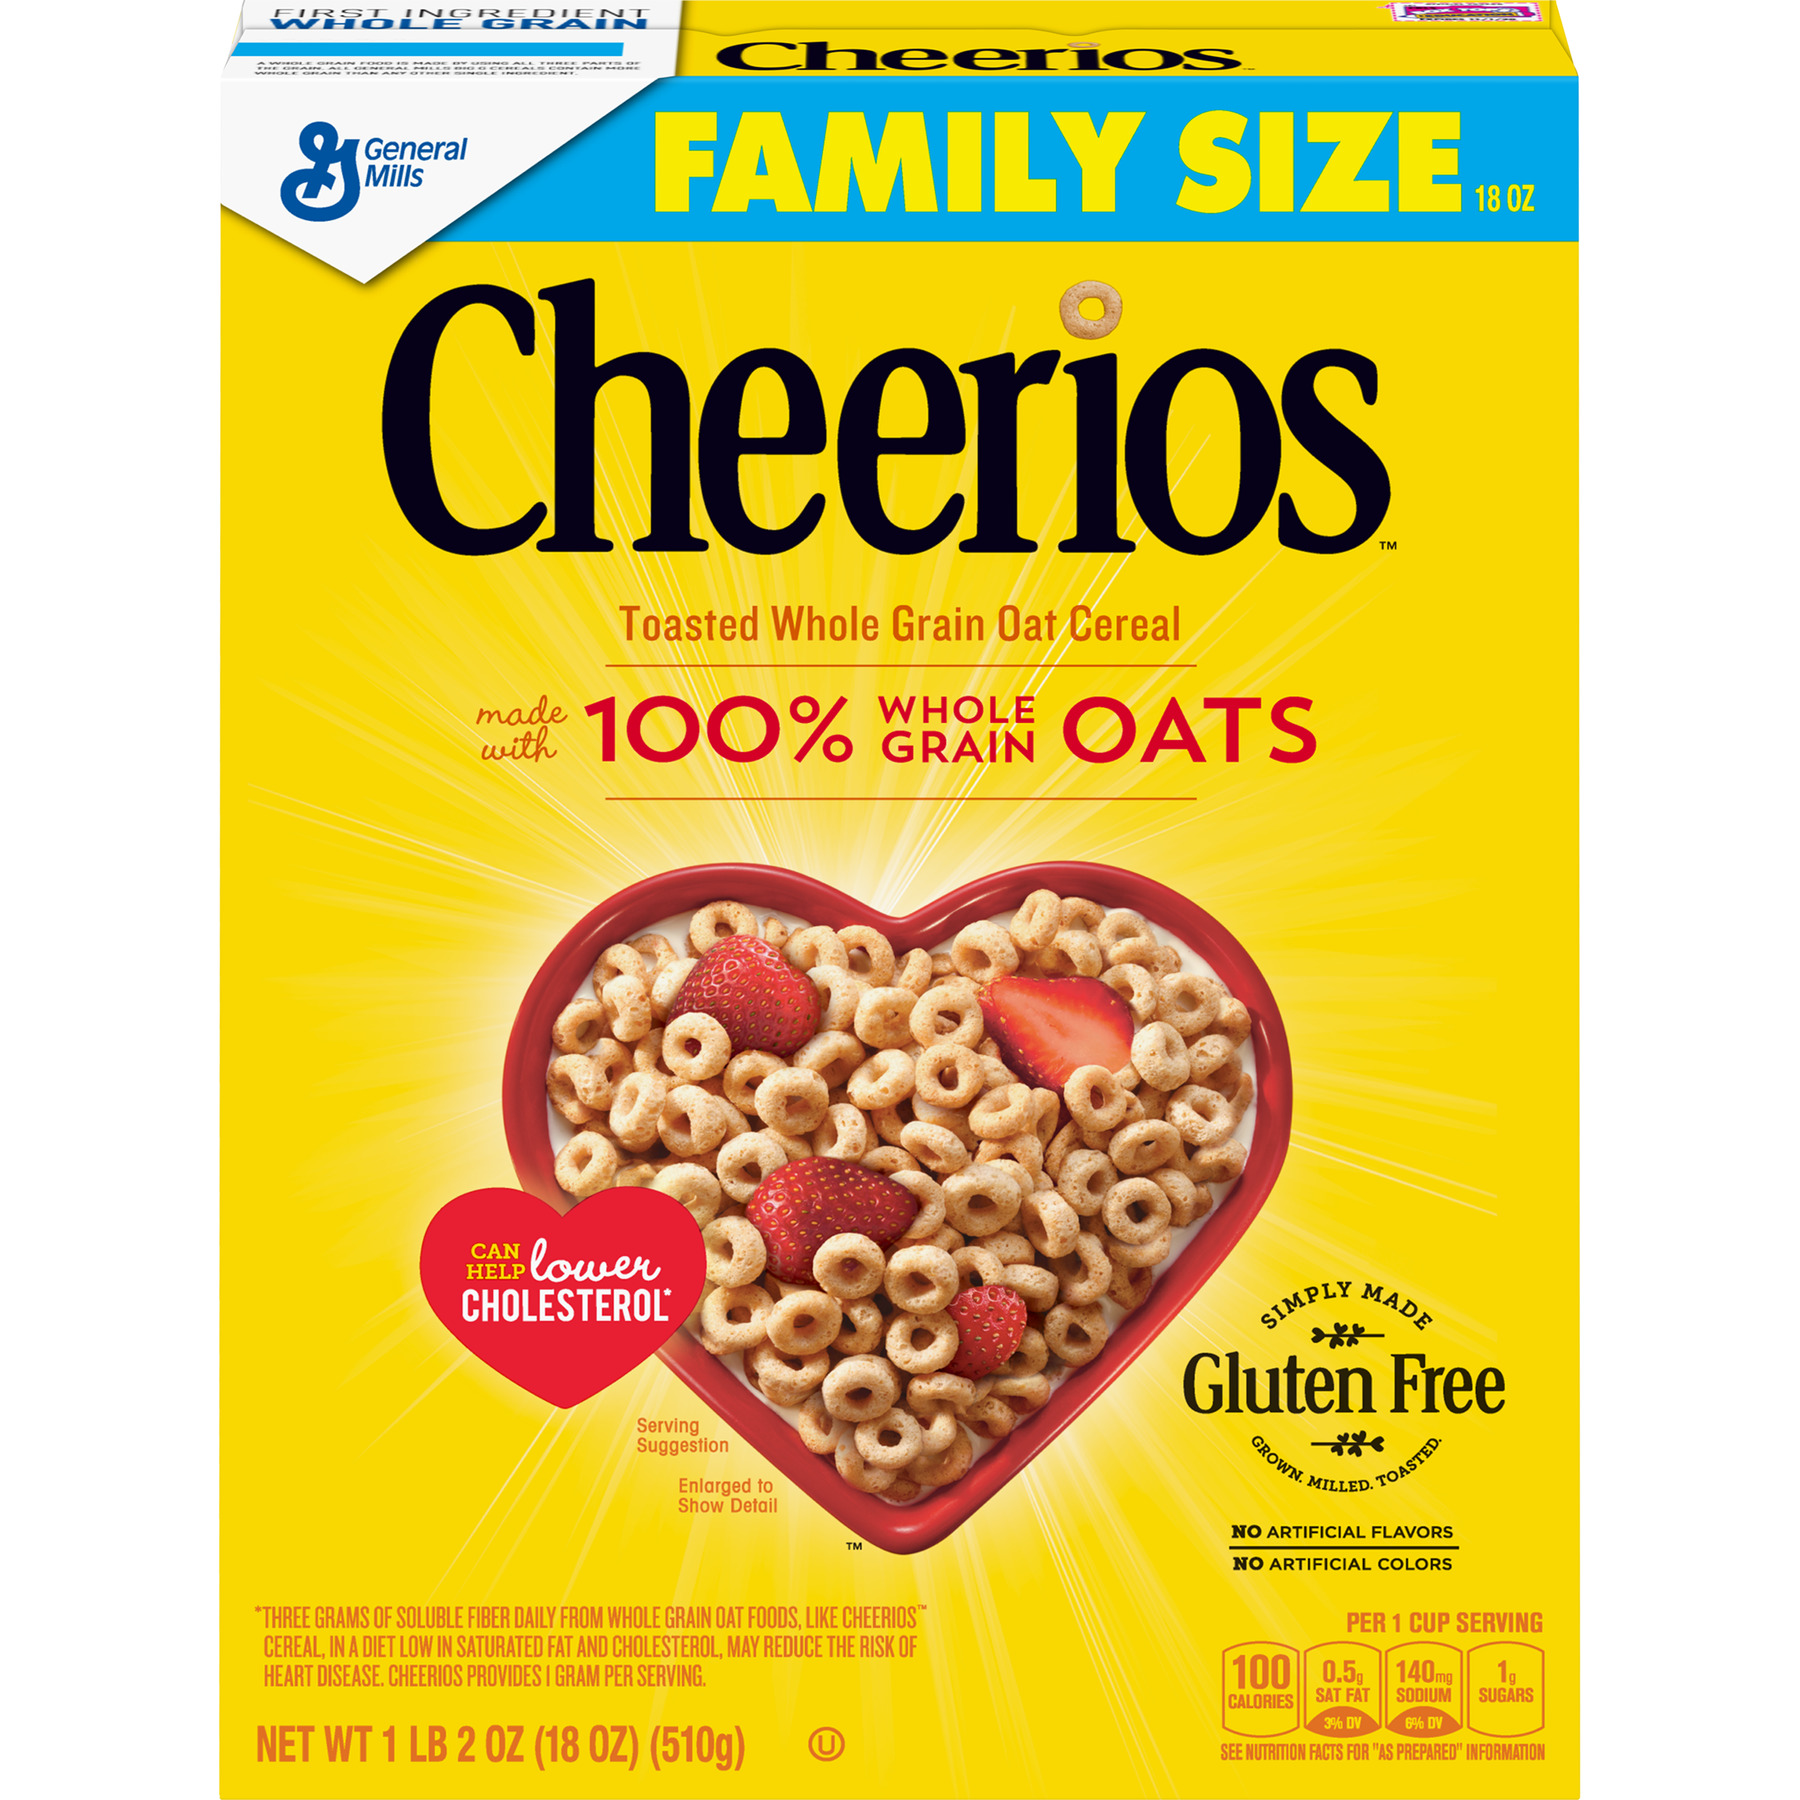 Cheerios Gluten Free Breakfast Cereal, 18 oz Box